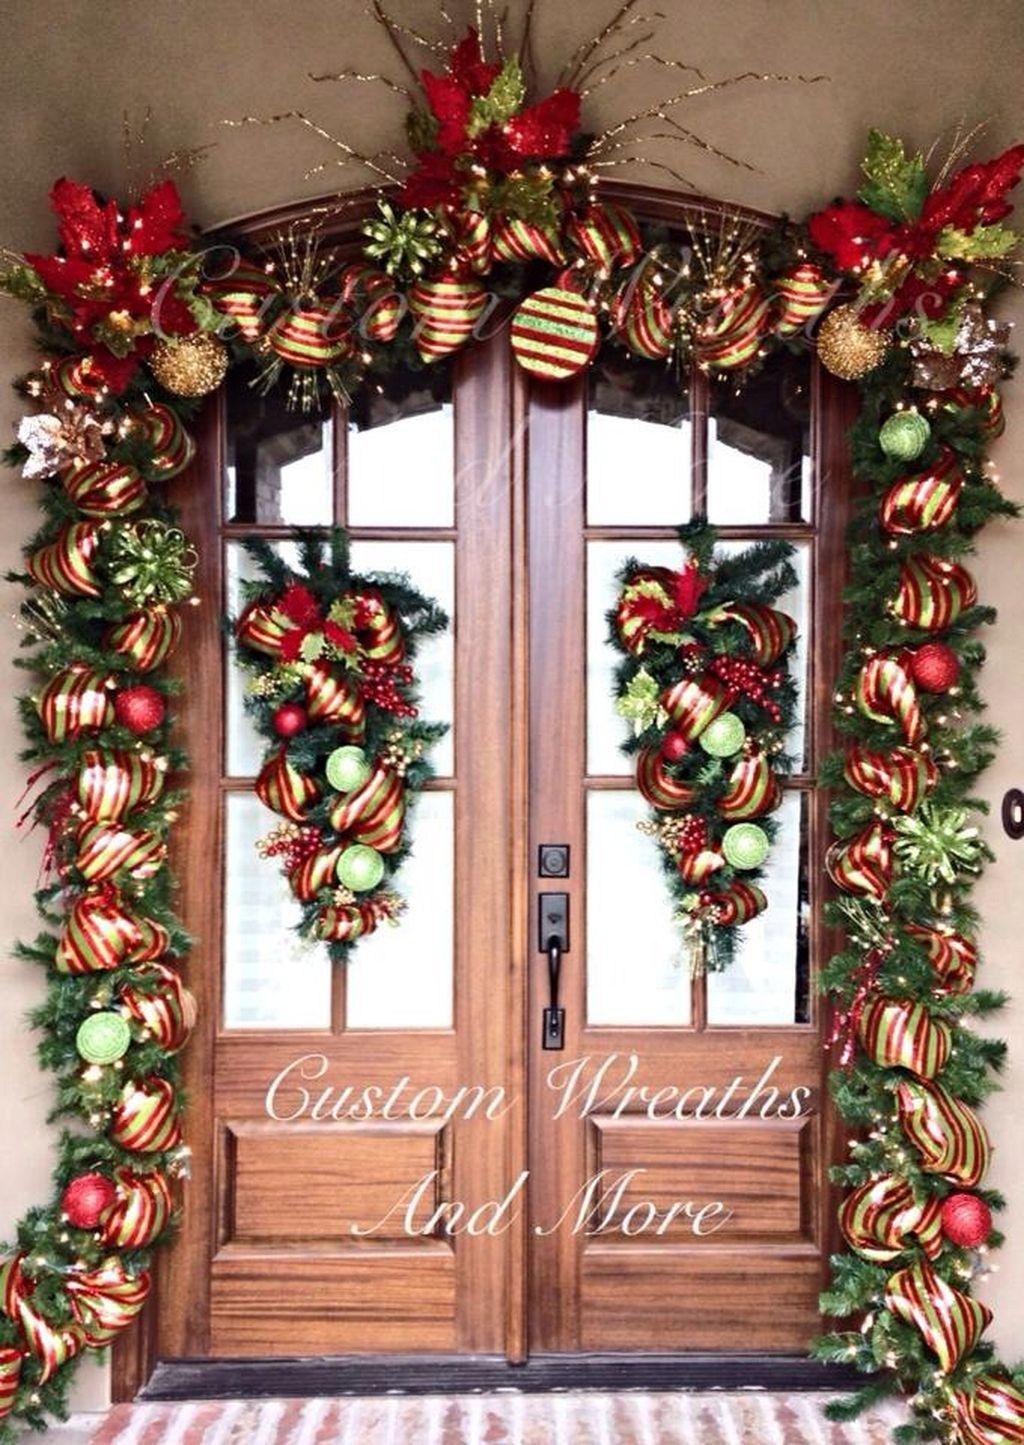 Simple But Beautiful Front Door Christmas Decoration Ideas 10 Front Door Christmas Decorations Christmas Decorations Garland Christmas Door Decorations